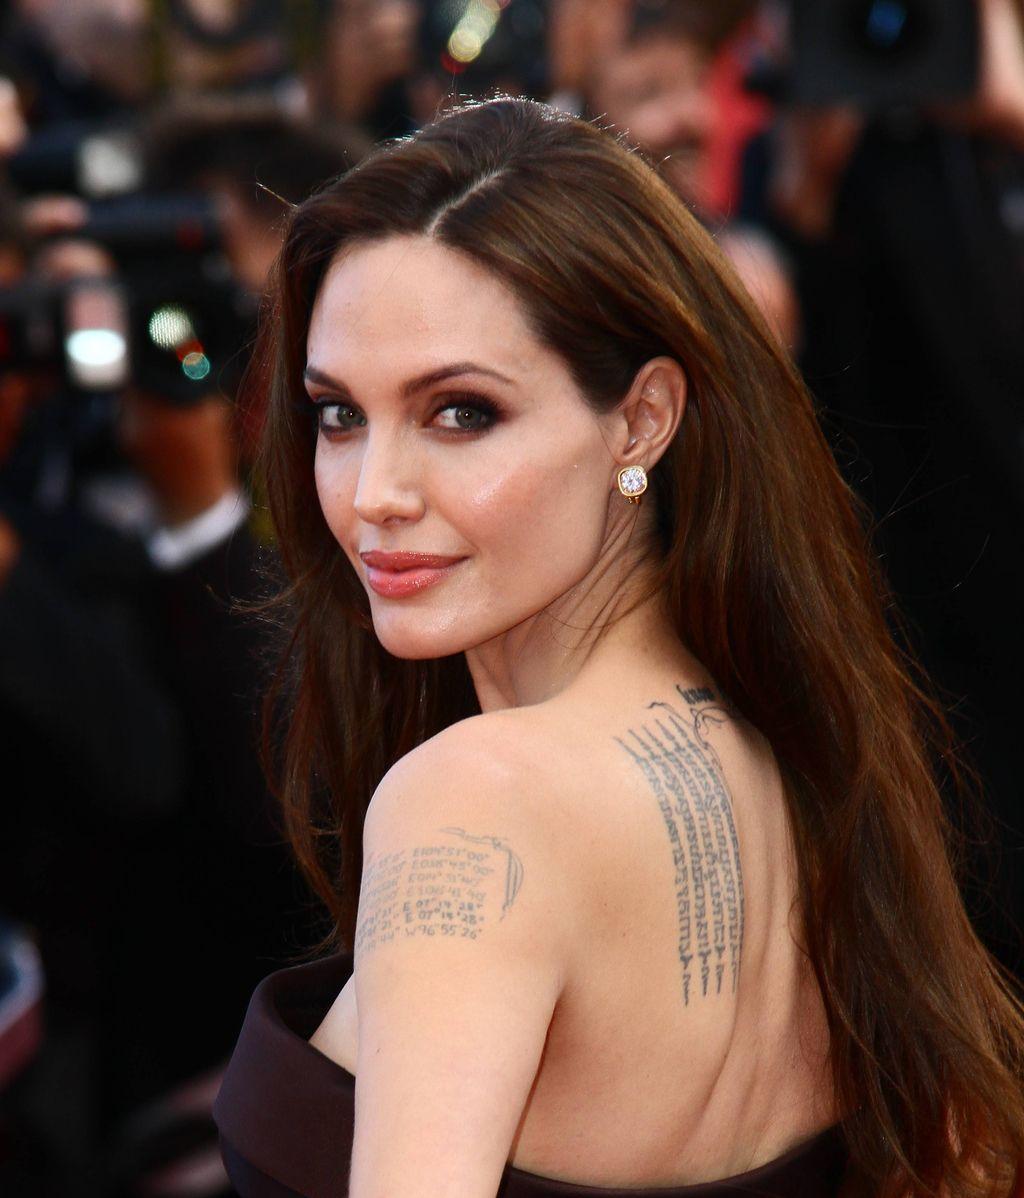 Angelina no olvida a ninguno